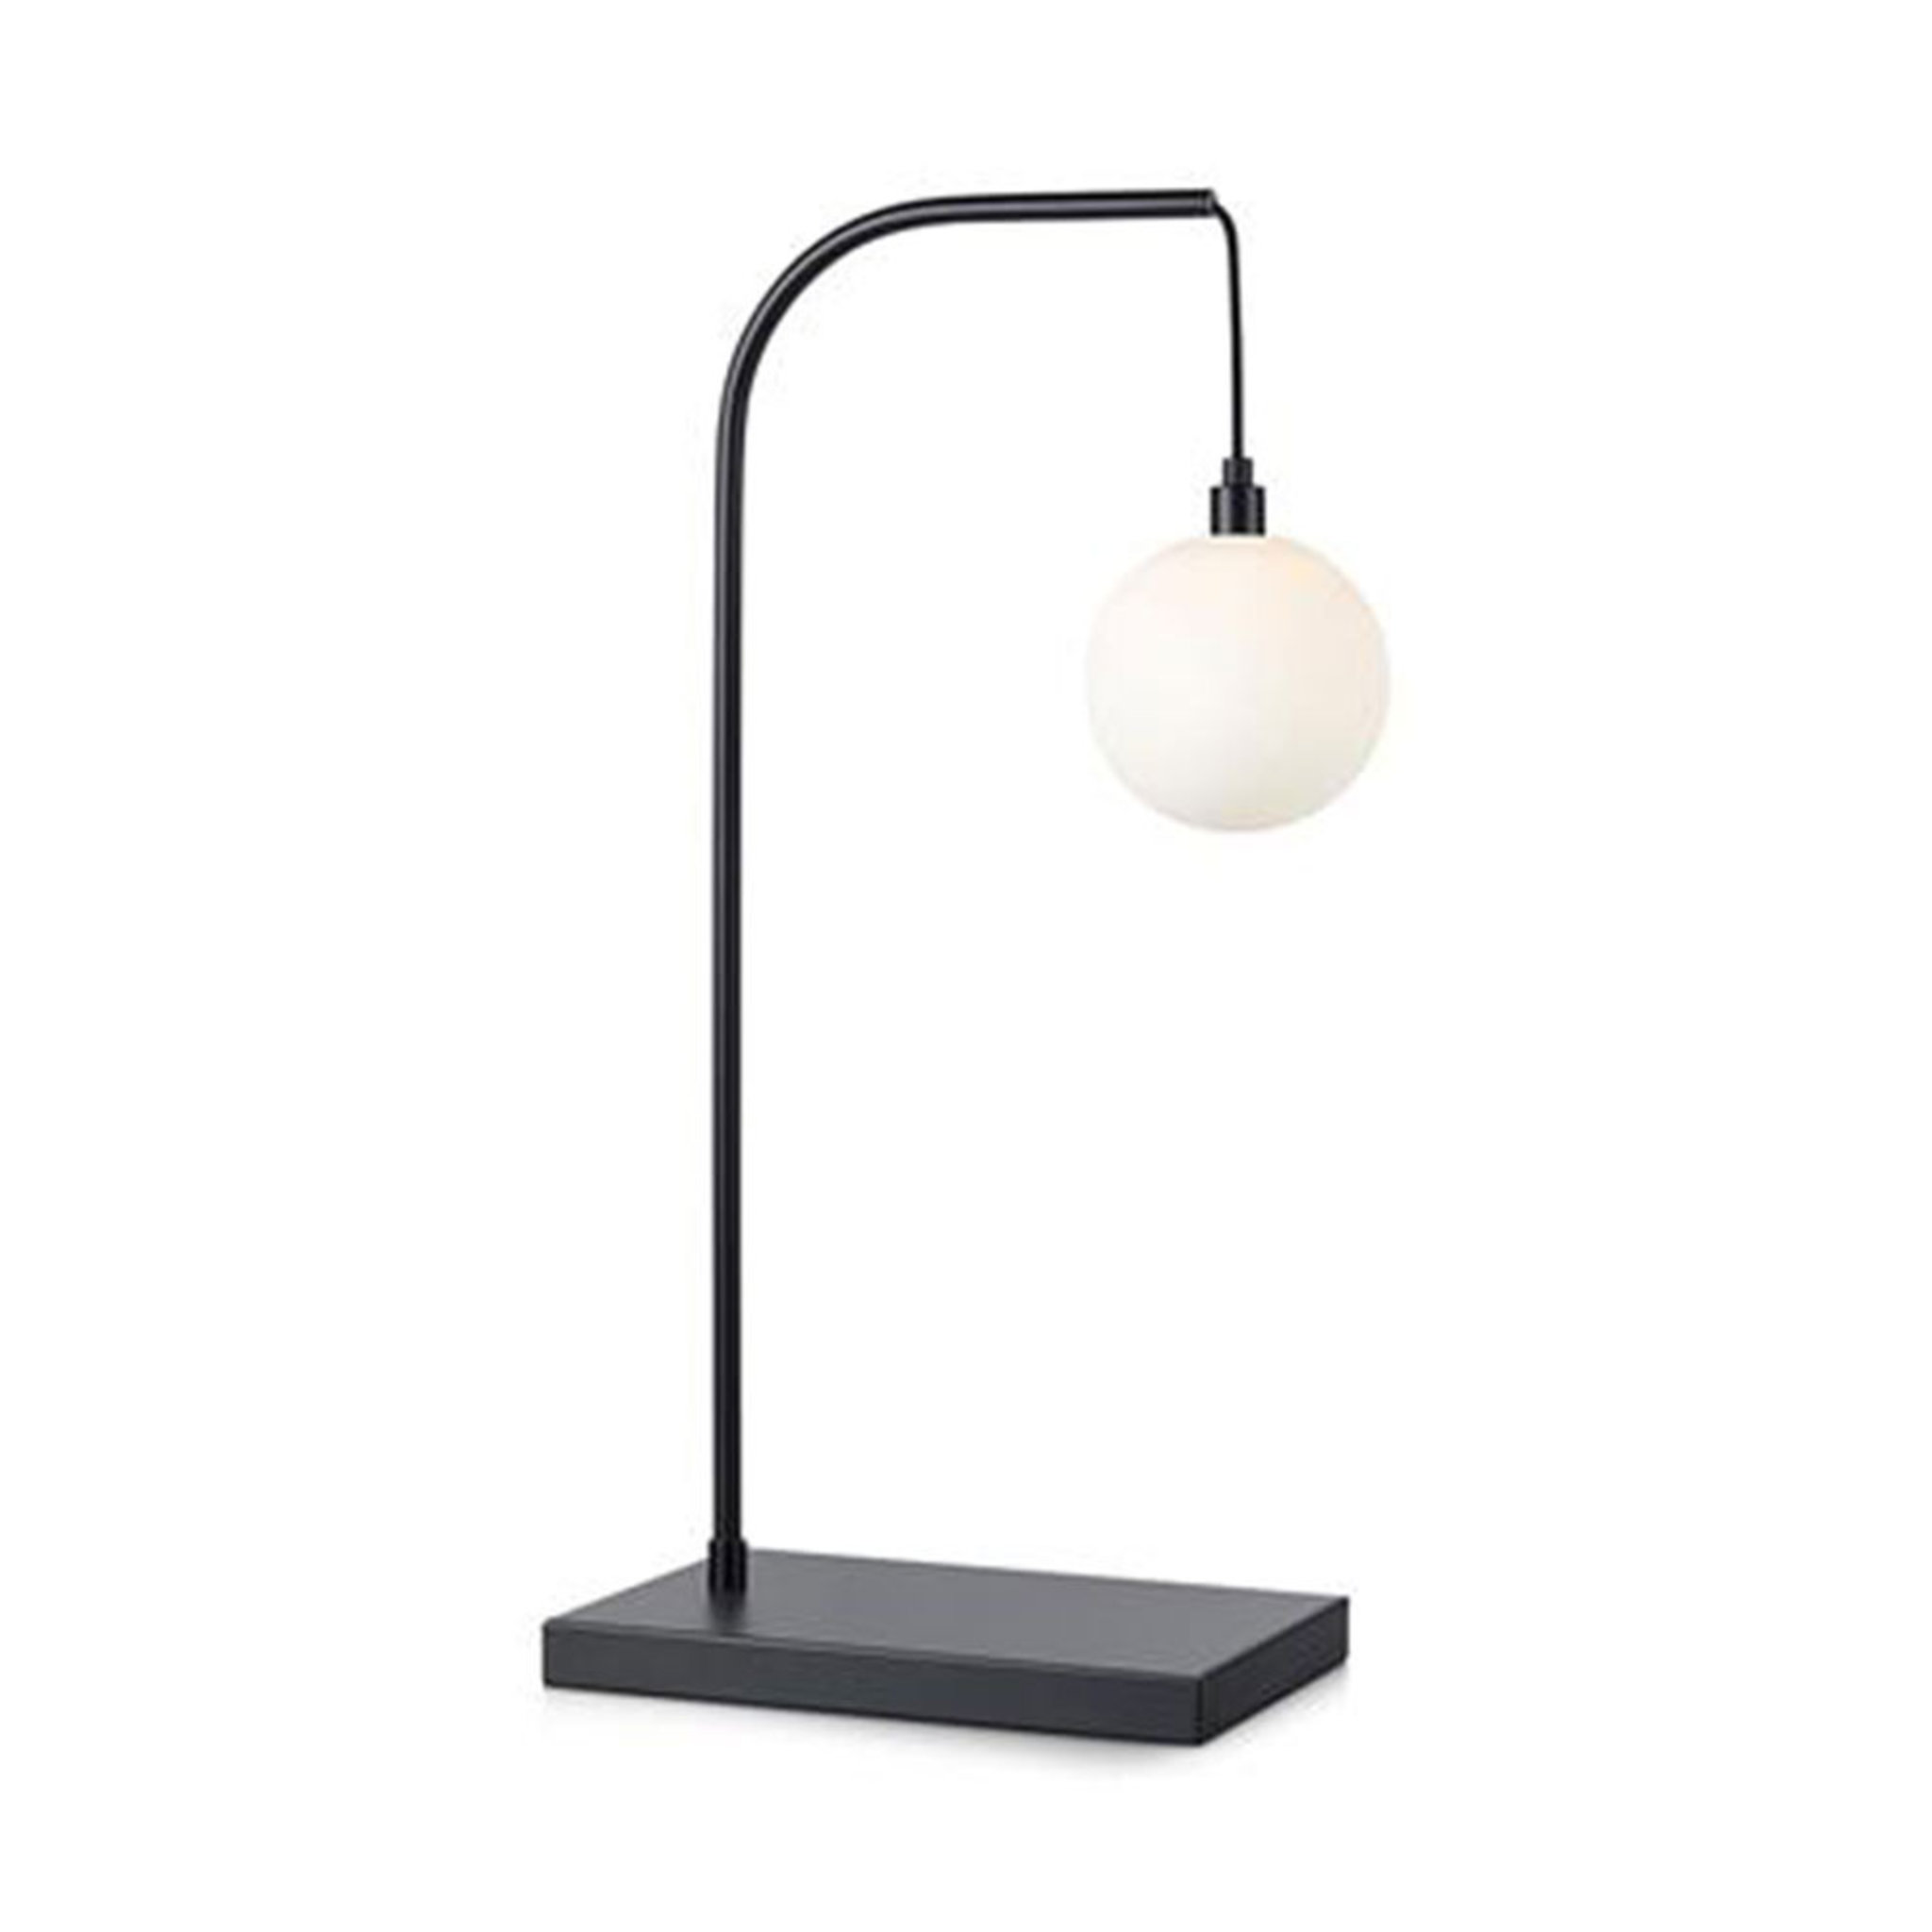 Bordslampa Buddy, svartopal